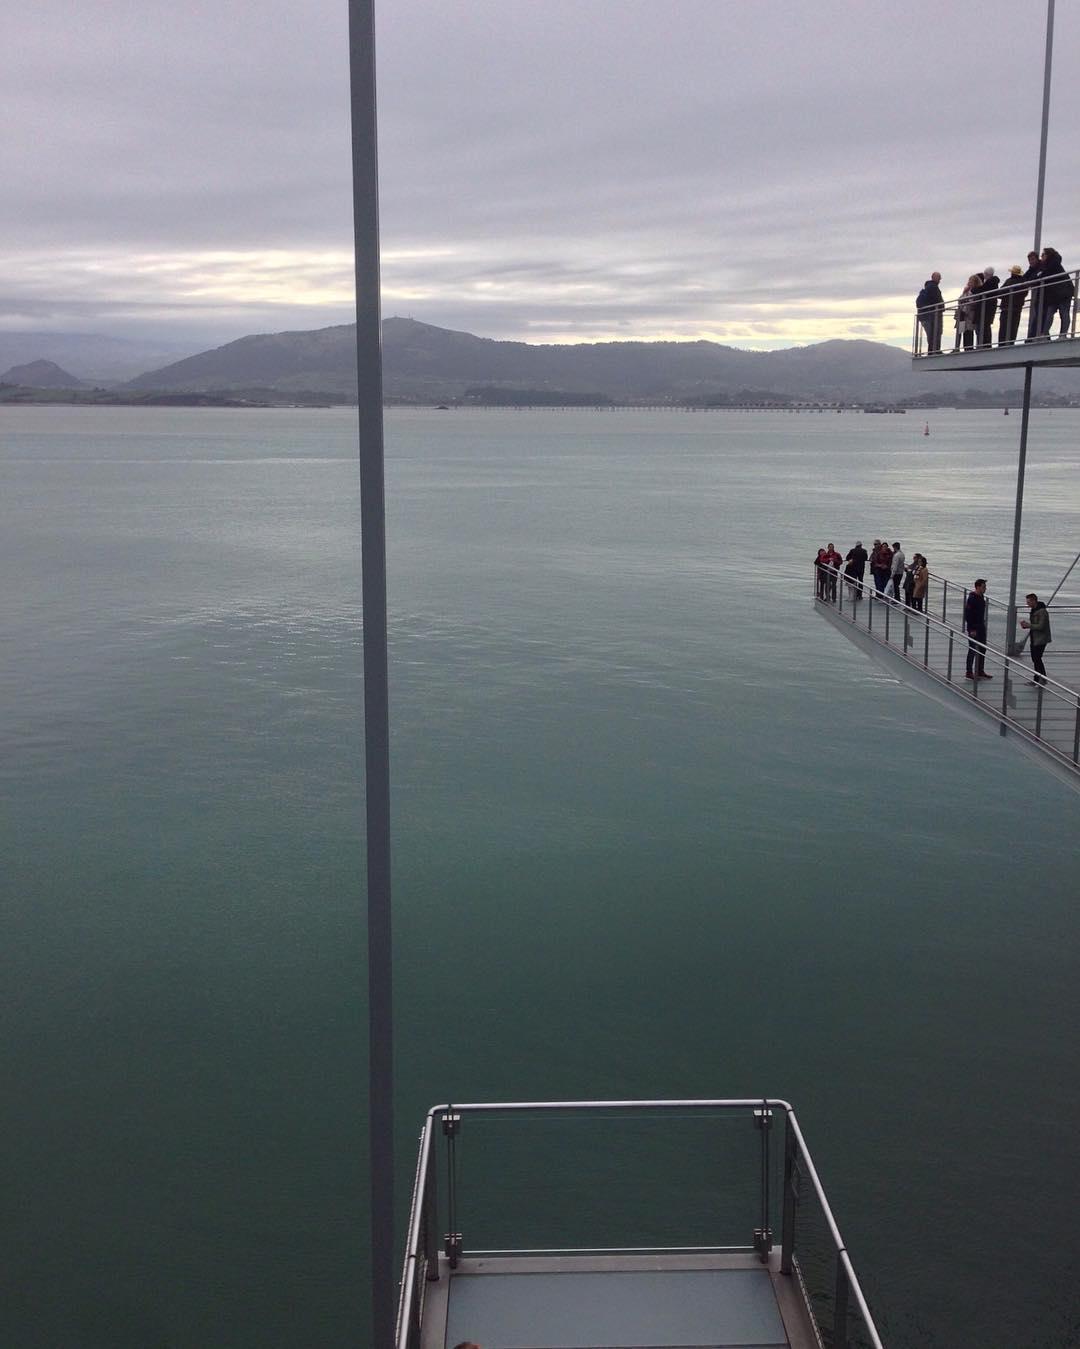 Pasarelas sobre el mar - Pasarelas Sobre El Mar